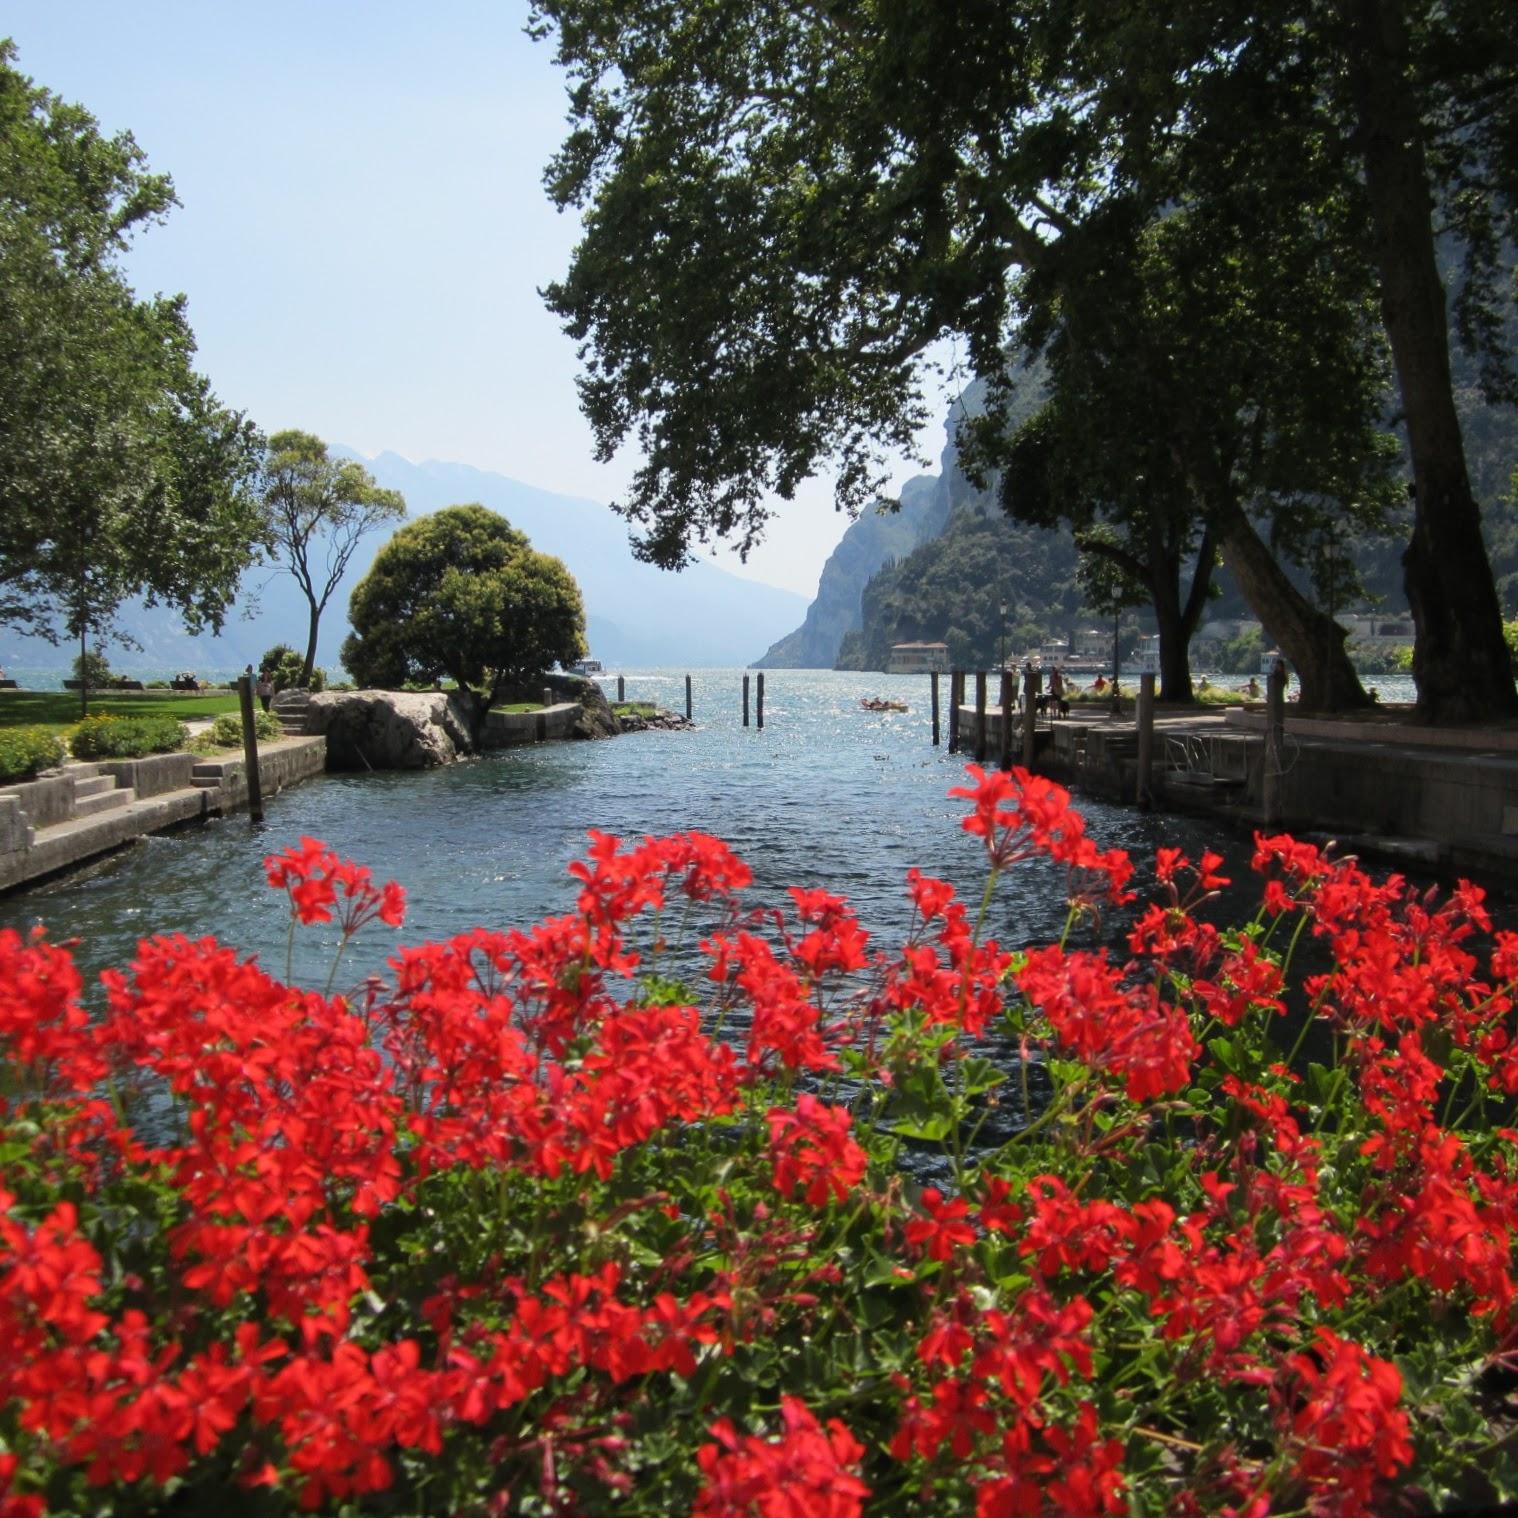 Het stadje Riva del Garda in beeld